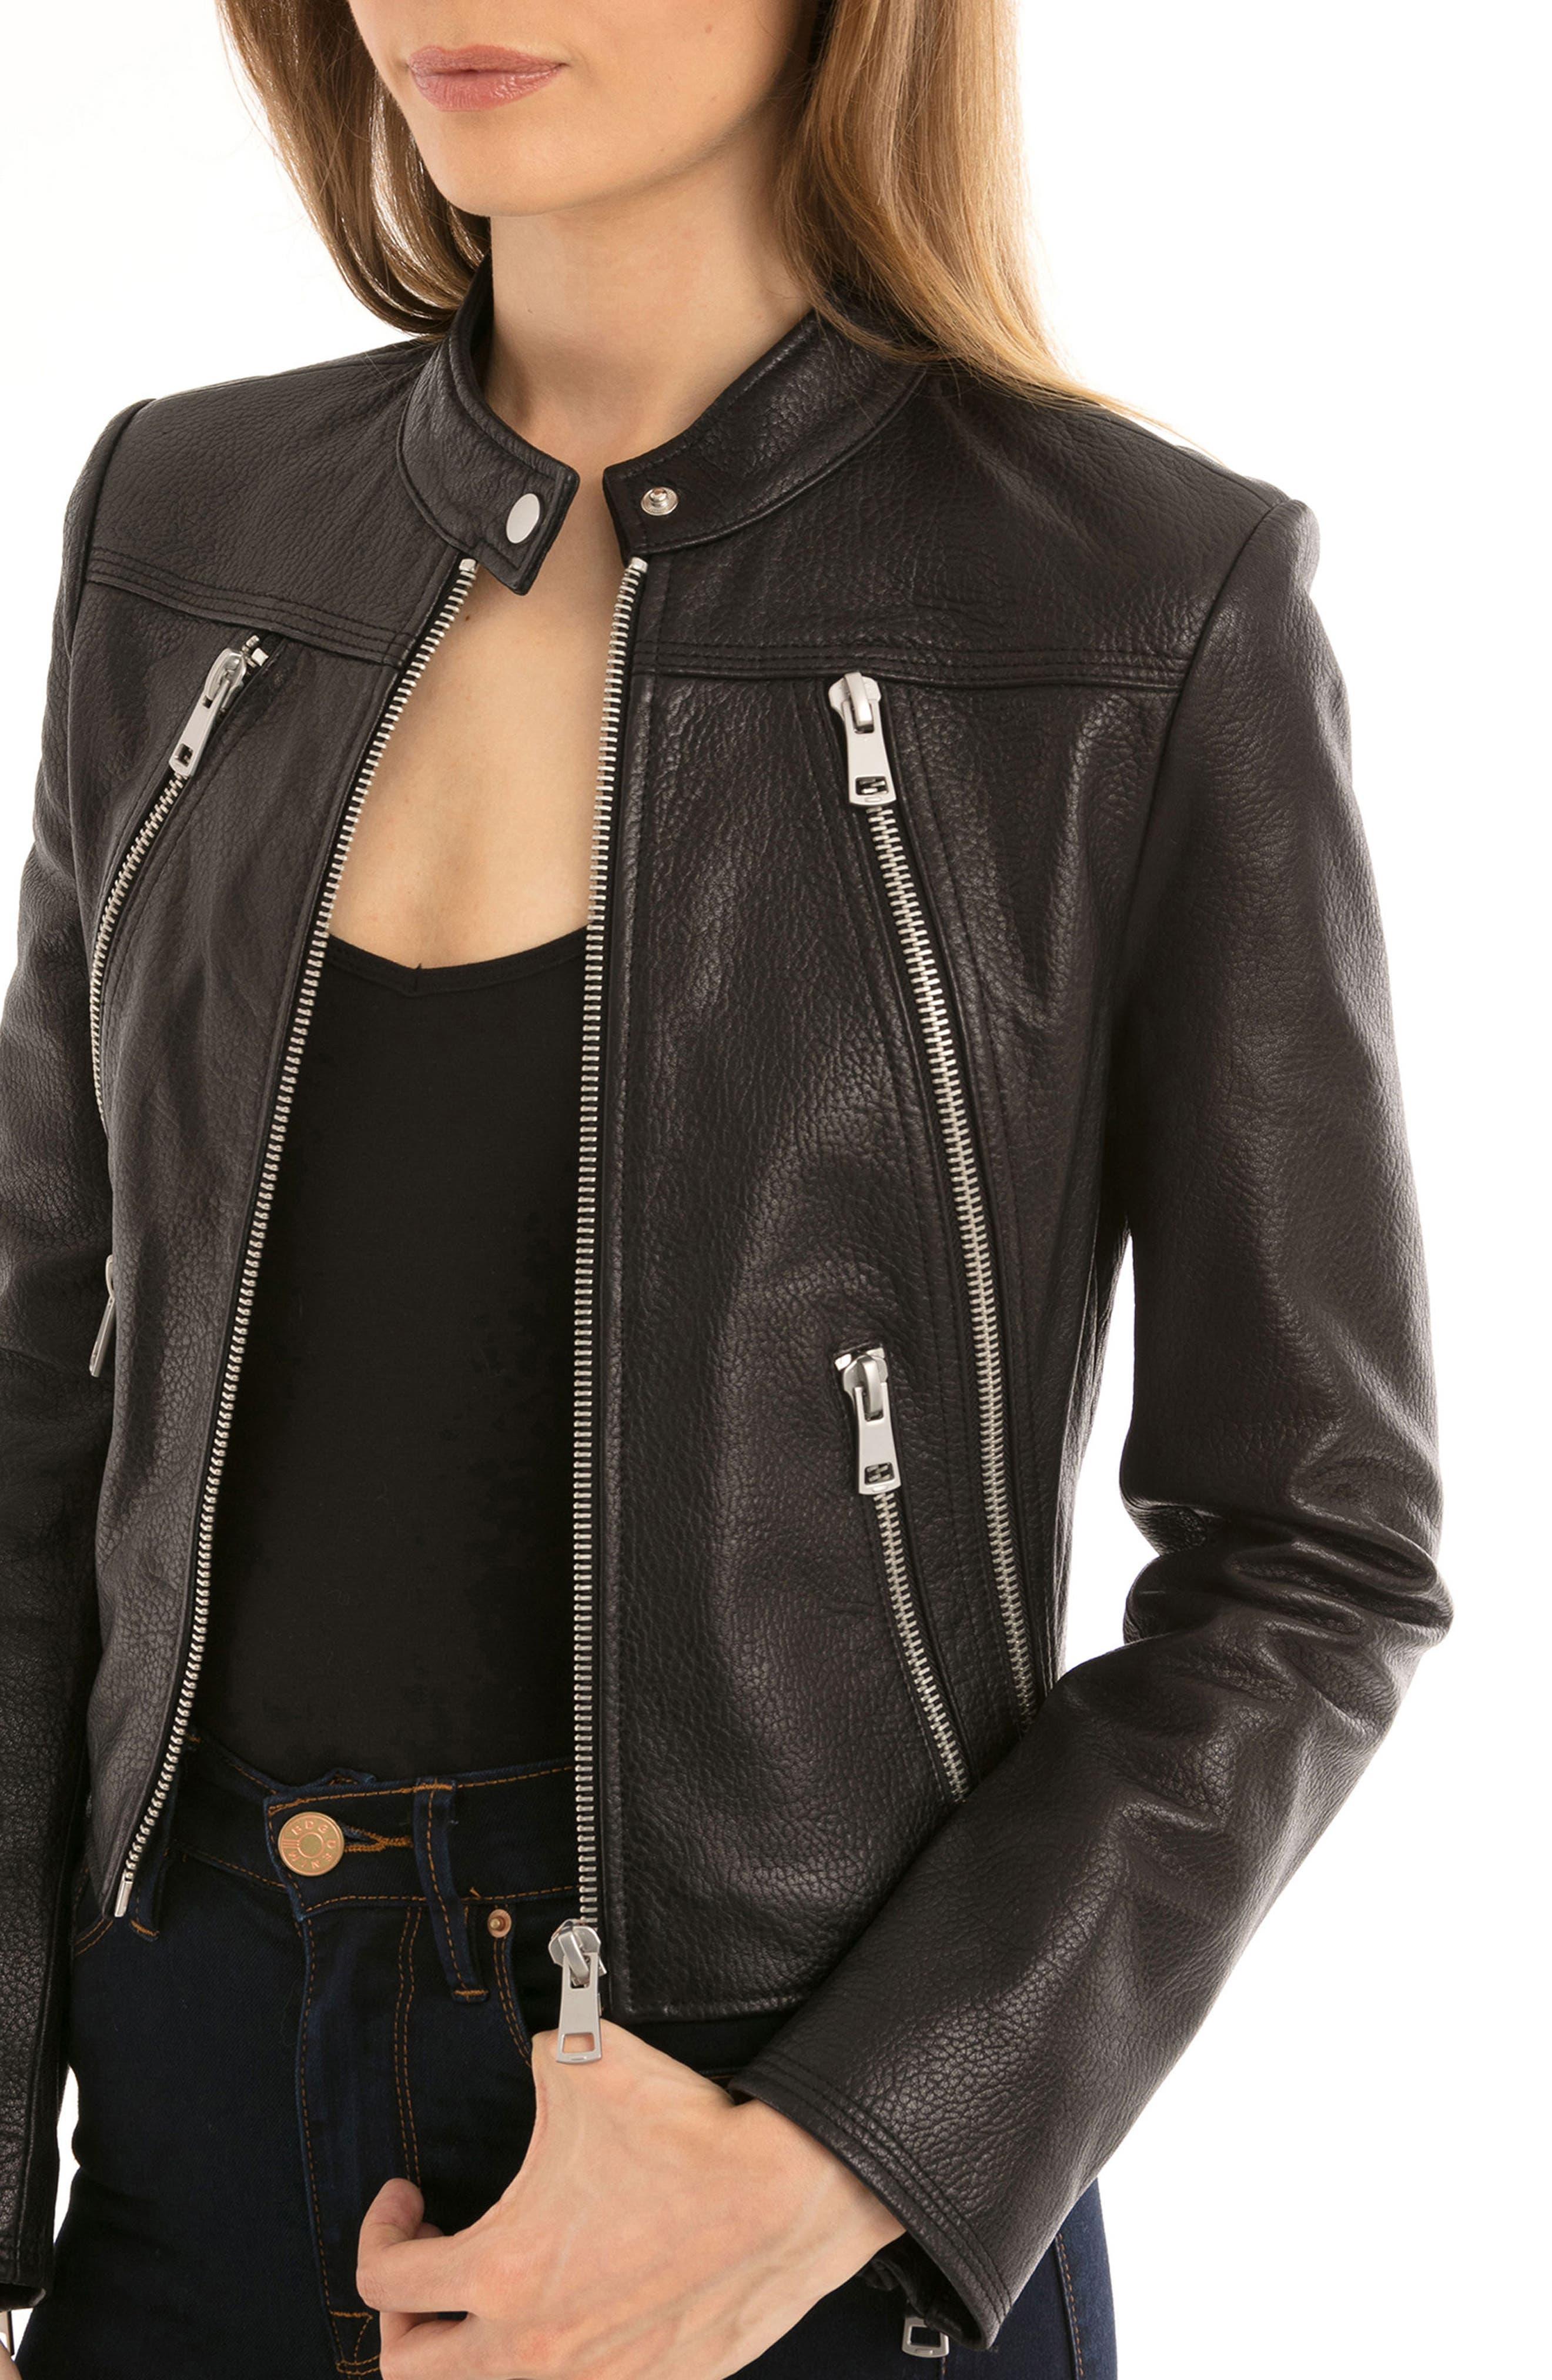 Bagatelle Textured Leather Jacket,                             Alternate thumbnail 4, color,                             001